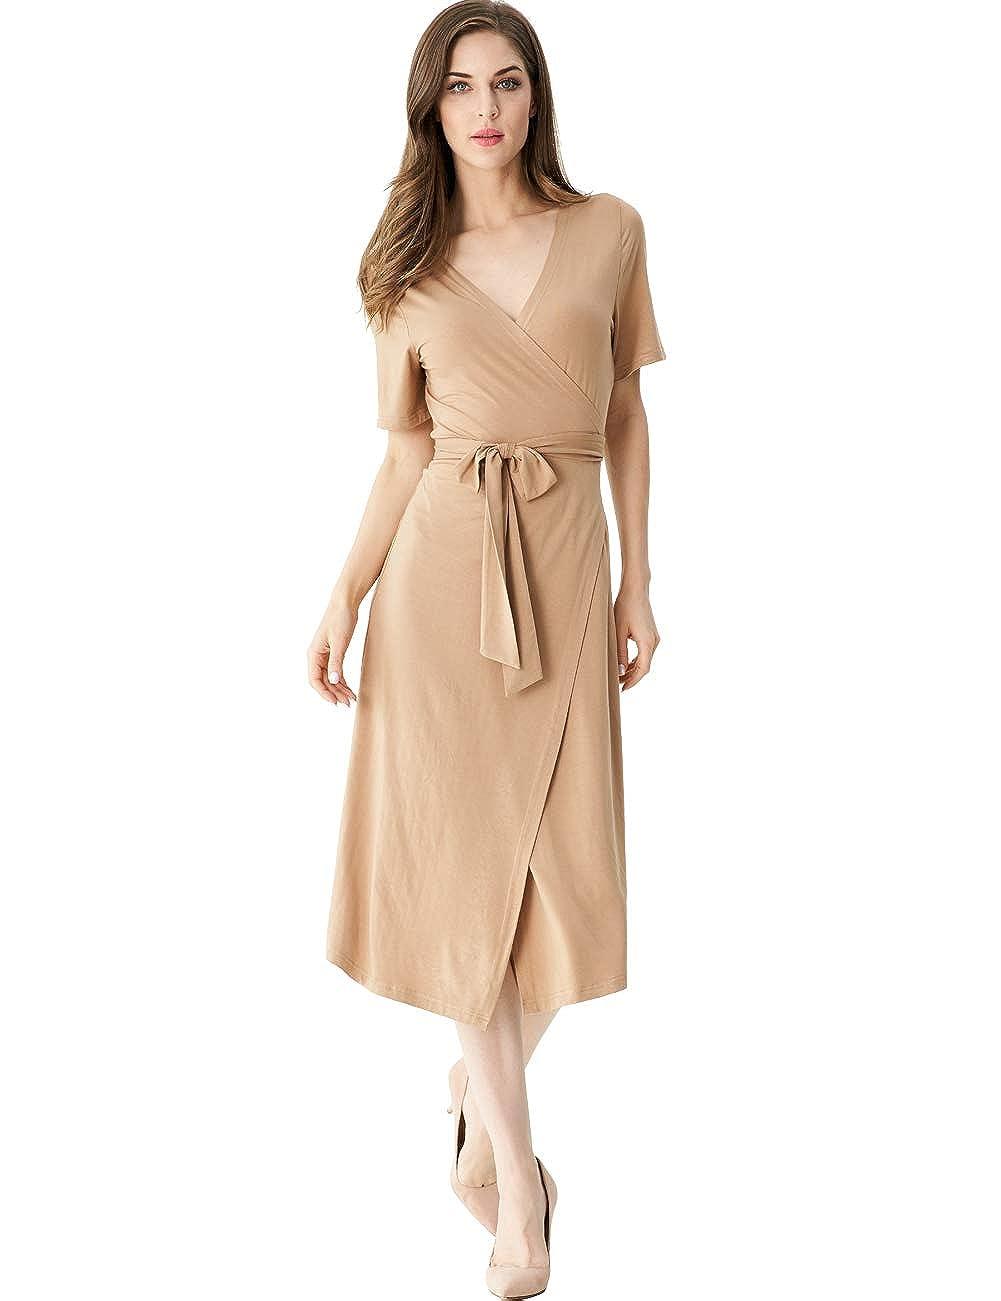 5e241e66c8 Khaki Melynnco Women's Short Sleeve Sexy VNeck Solid Split A line Casual Wrap  Dress